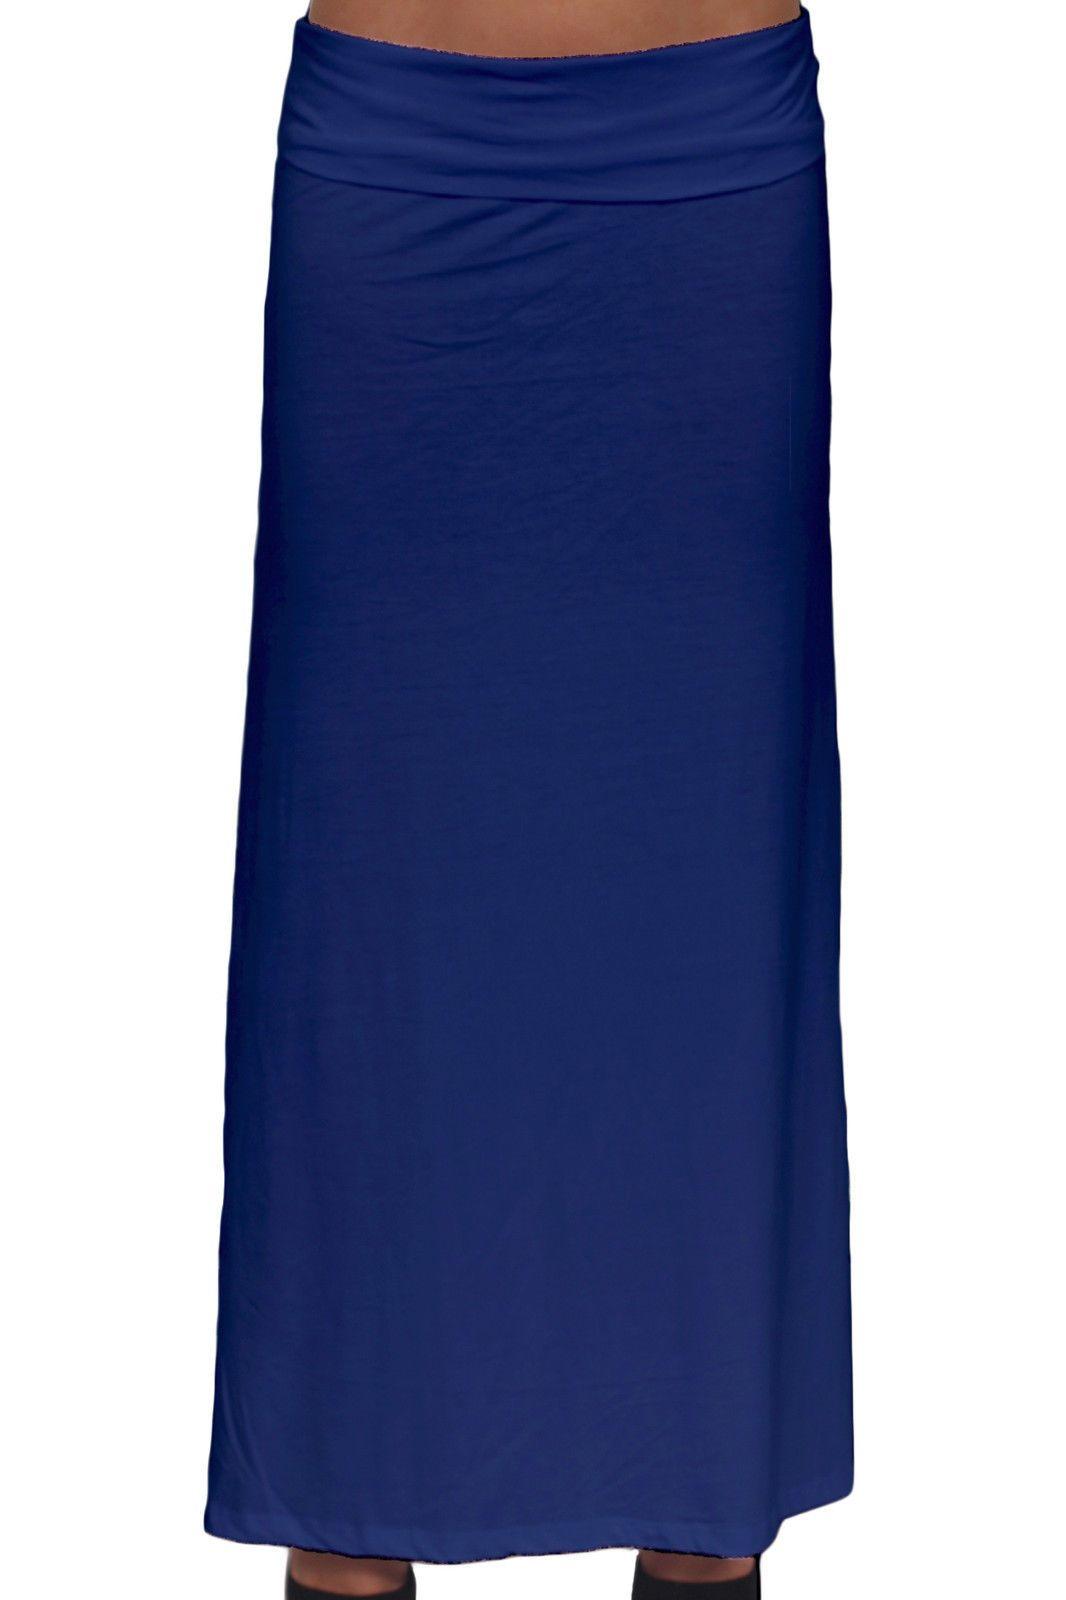 4611bb735fe Women S Royal Plus Size Full Length Folding Waist Rayon Maxi Skirt 1Xl 2Xl  3Xl